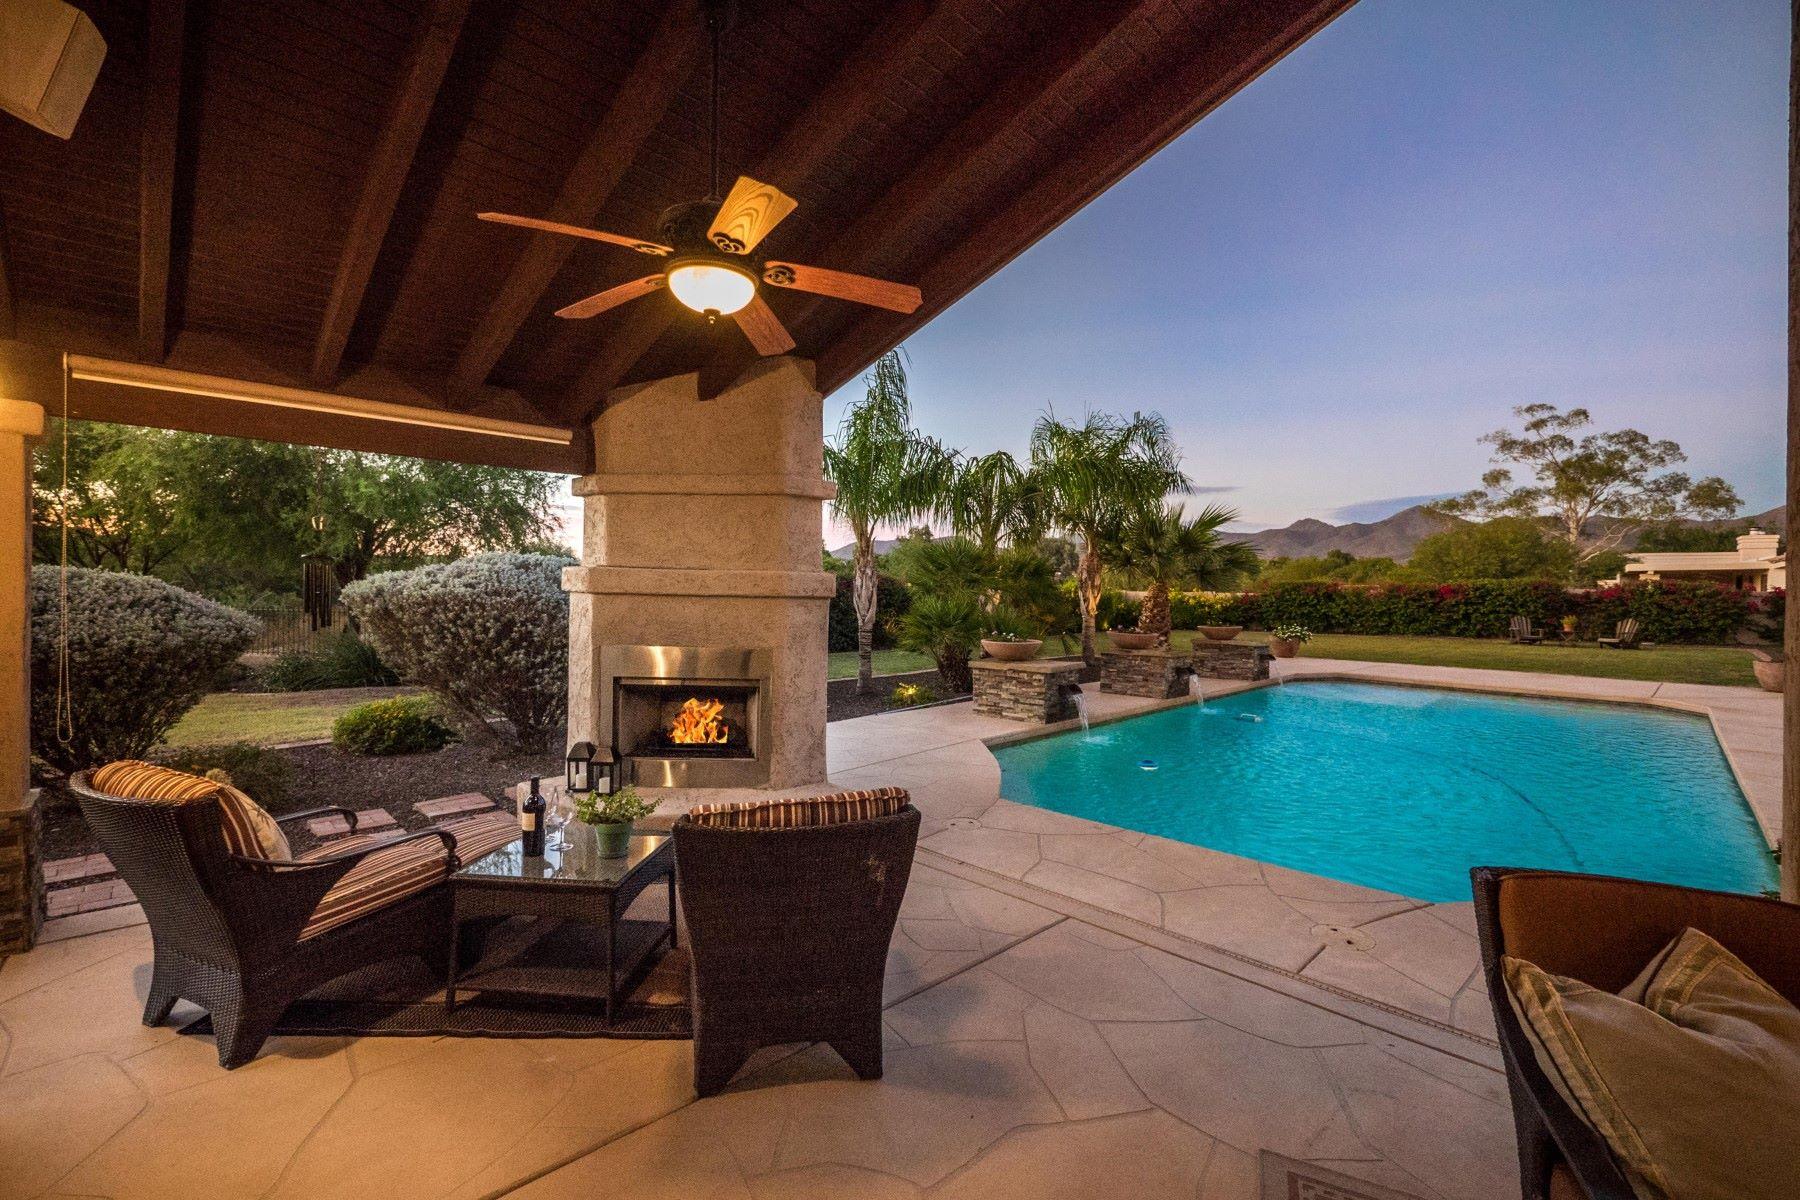 Частный односемейный дом для того Продажа на Spacious Scottsdale Home with Views & Acreage 12516 E Silver Spur St, Scottsdale, Аризона, 85259 Соединенные Штаты